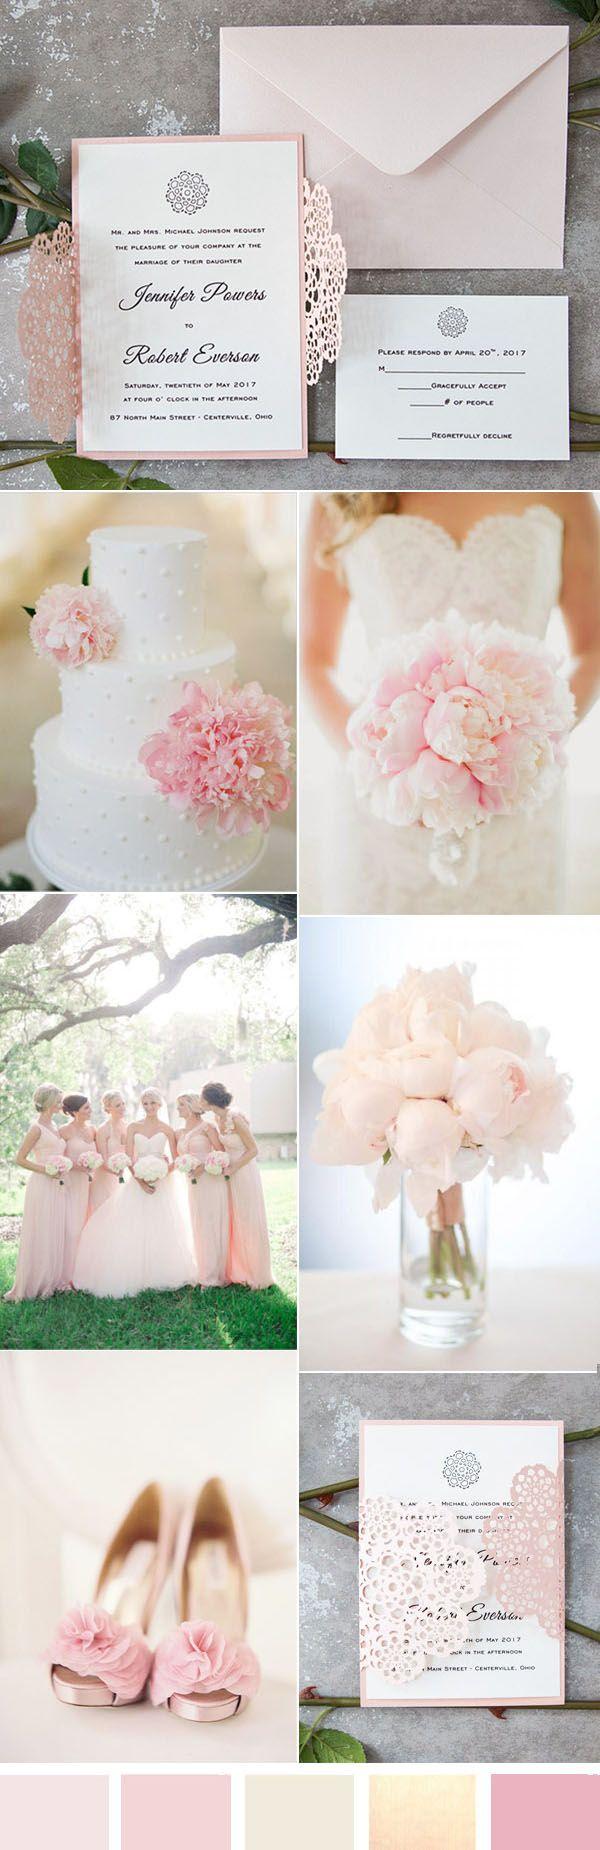 elegant and romantic soft pink wedding ideas and invitations#weddinginvitations #pinkwedding #ElegantWeddingInvites